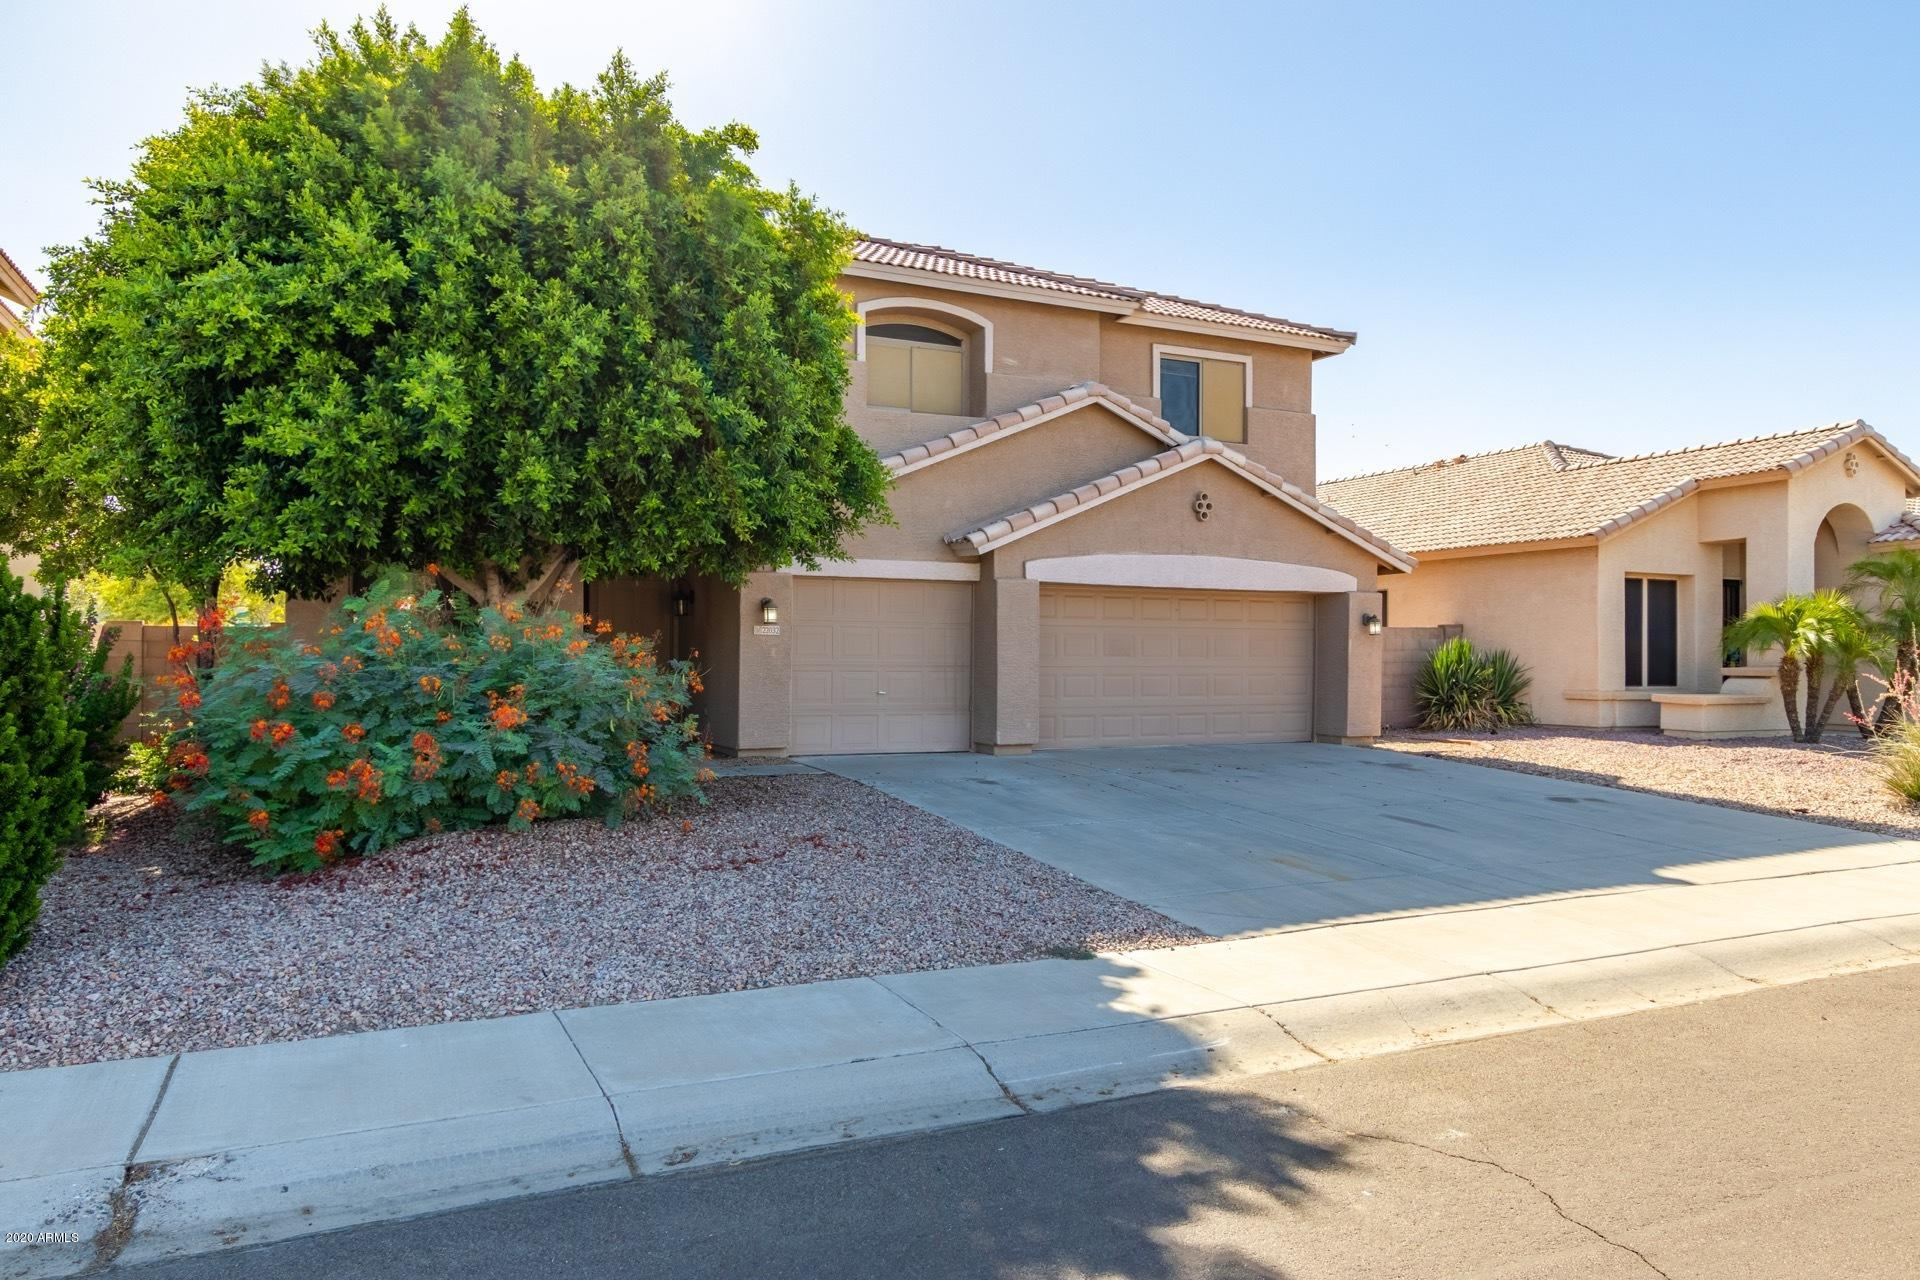 Photo of 22032 N 33RD Drive, Phoenix, AZ 85027